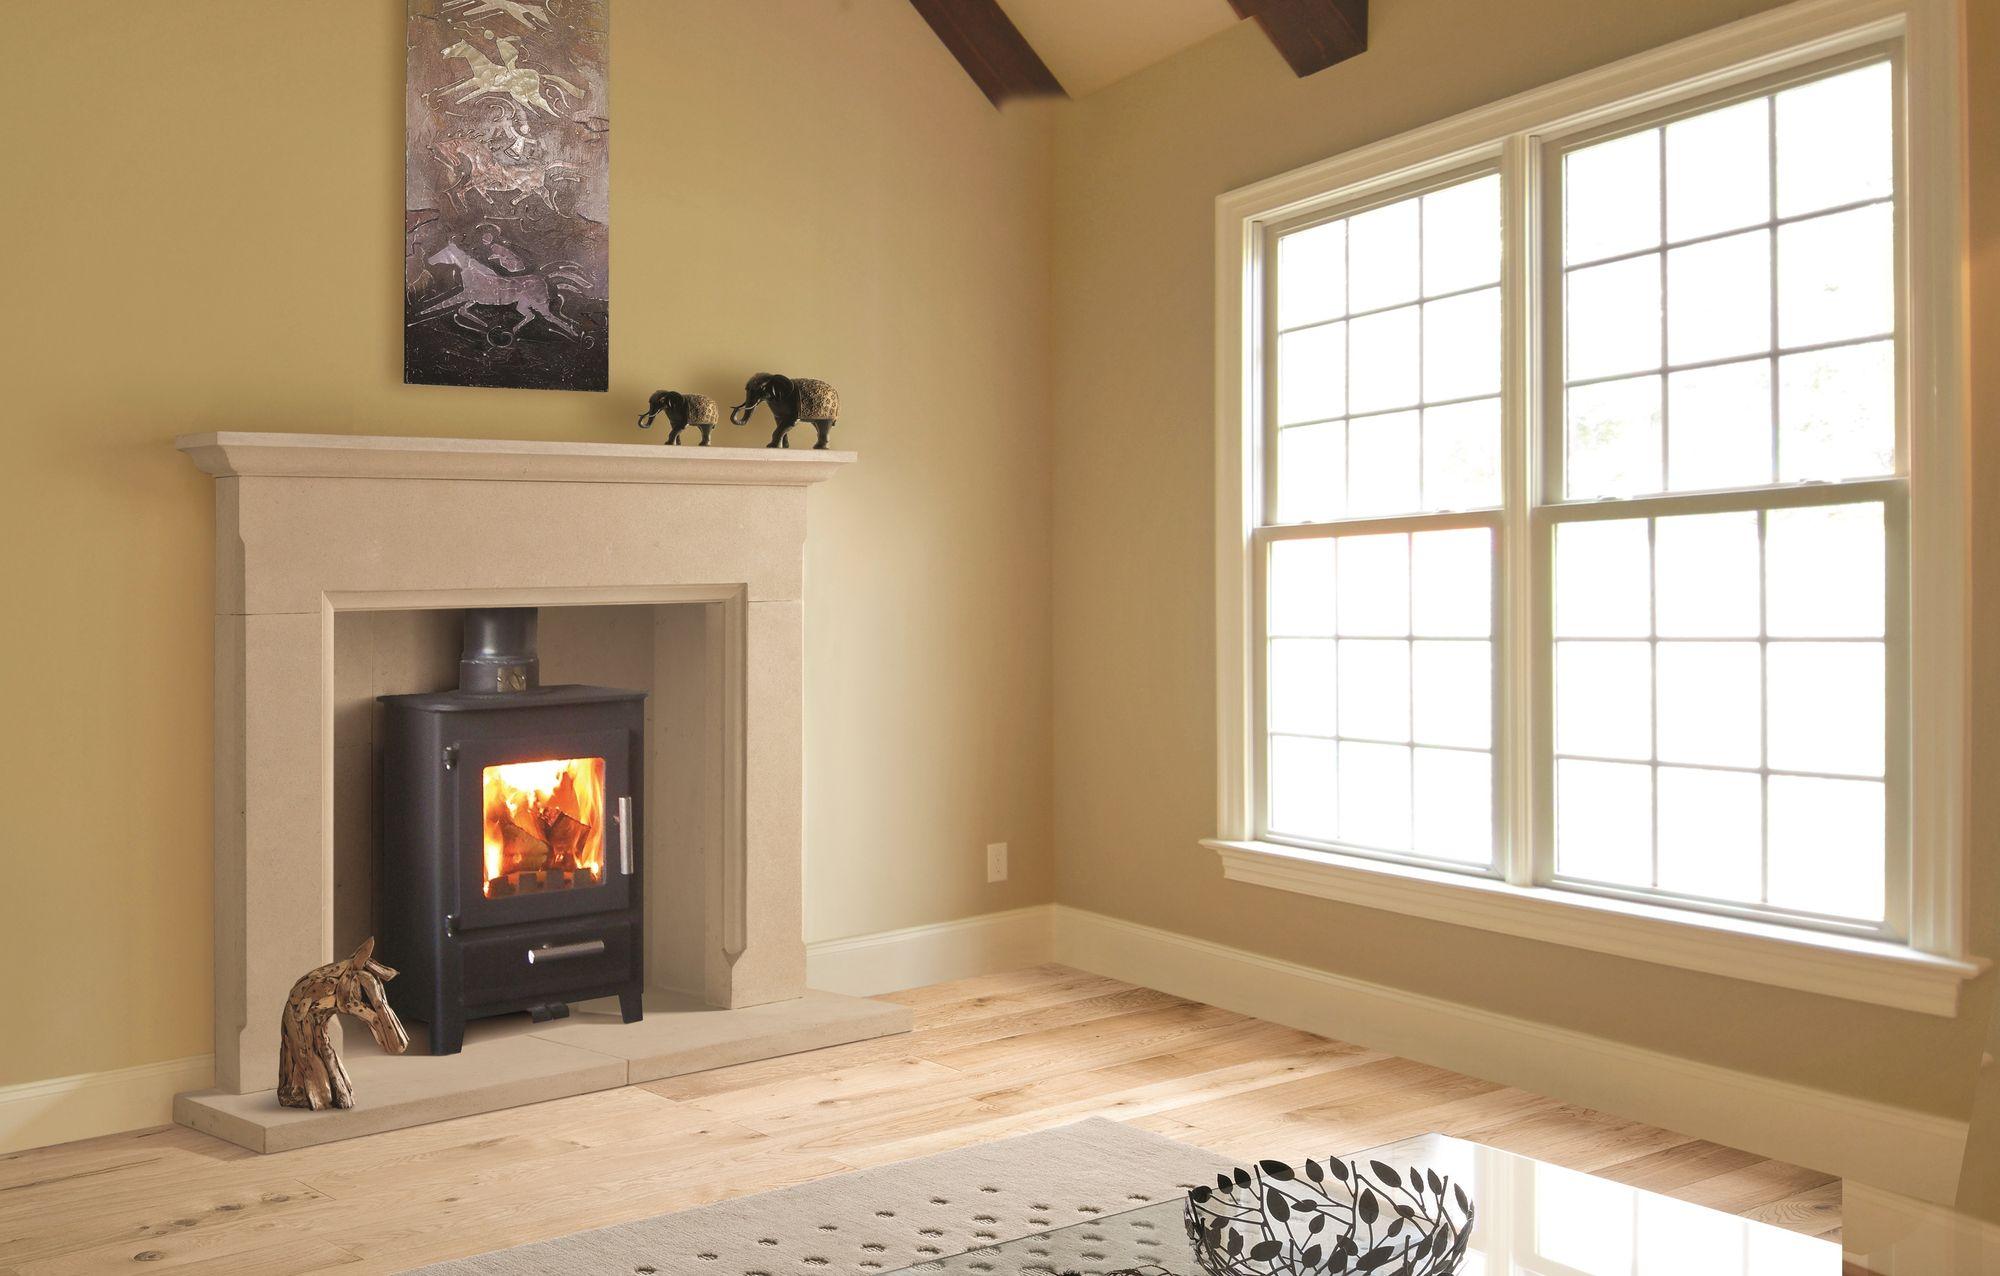 The Kingsbridge Bathstone Fireplace